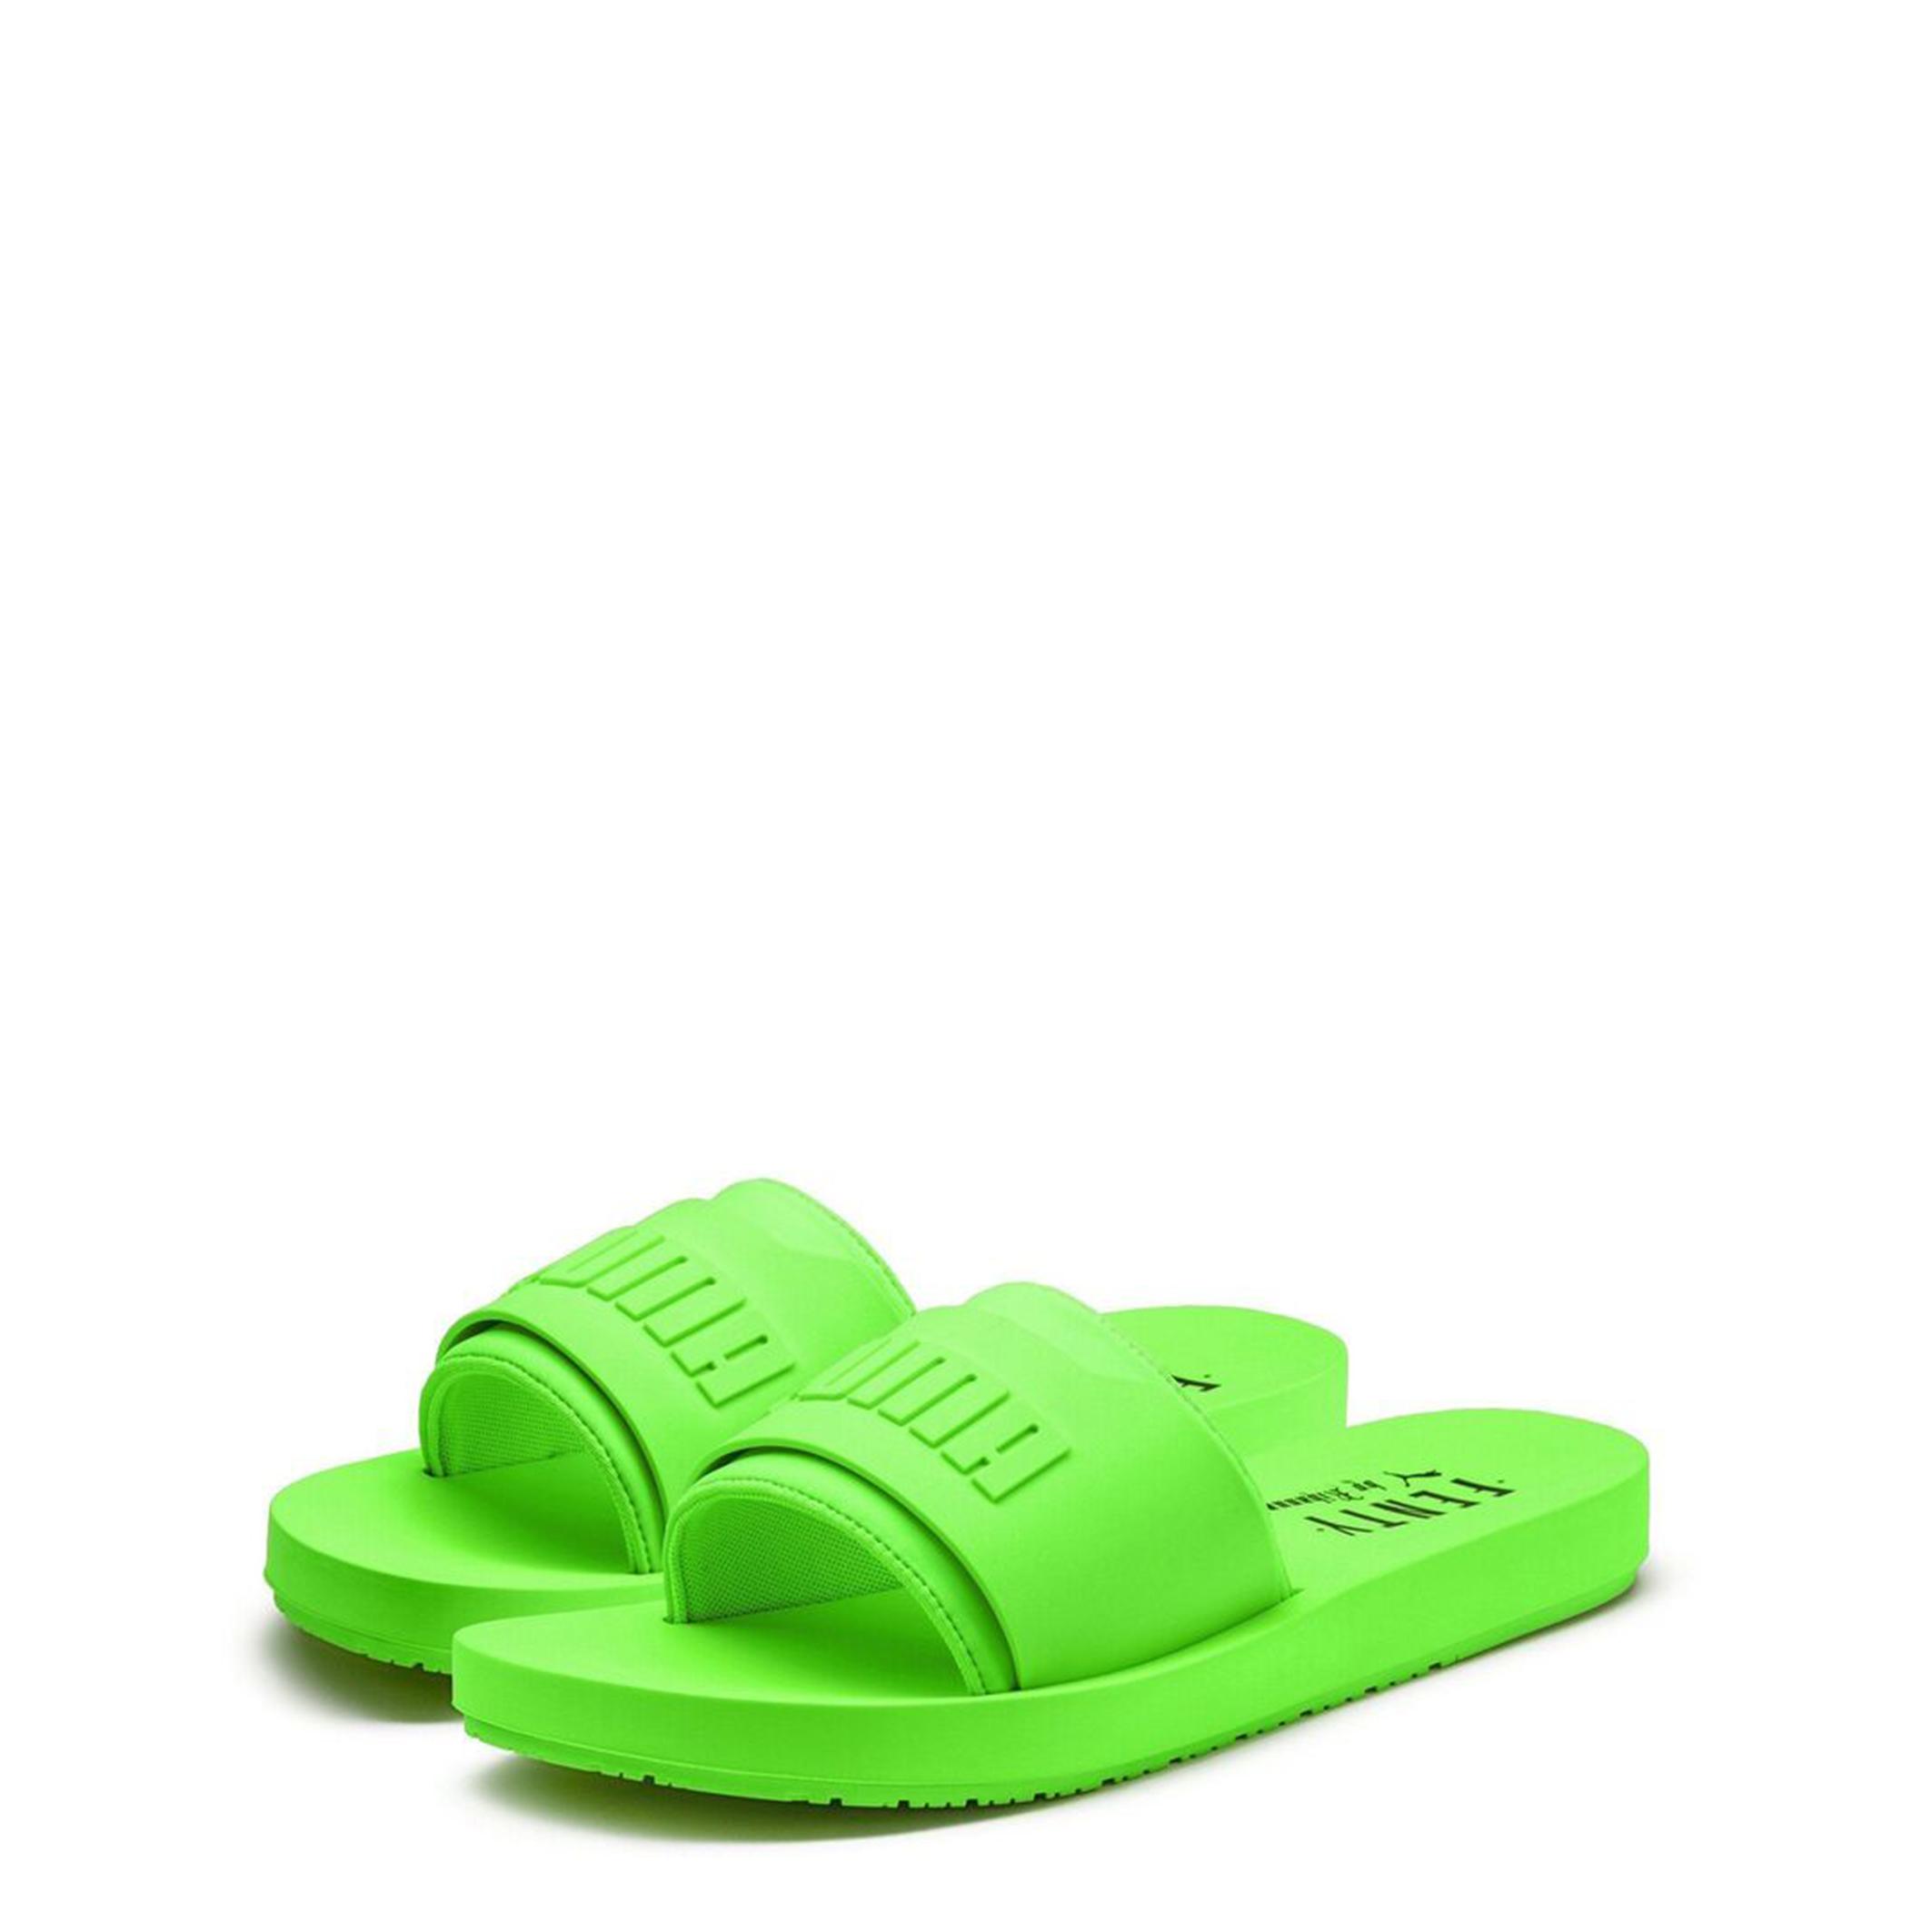 tout neuf 8712c 1a28c Puma - Claquettes vert fluo